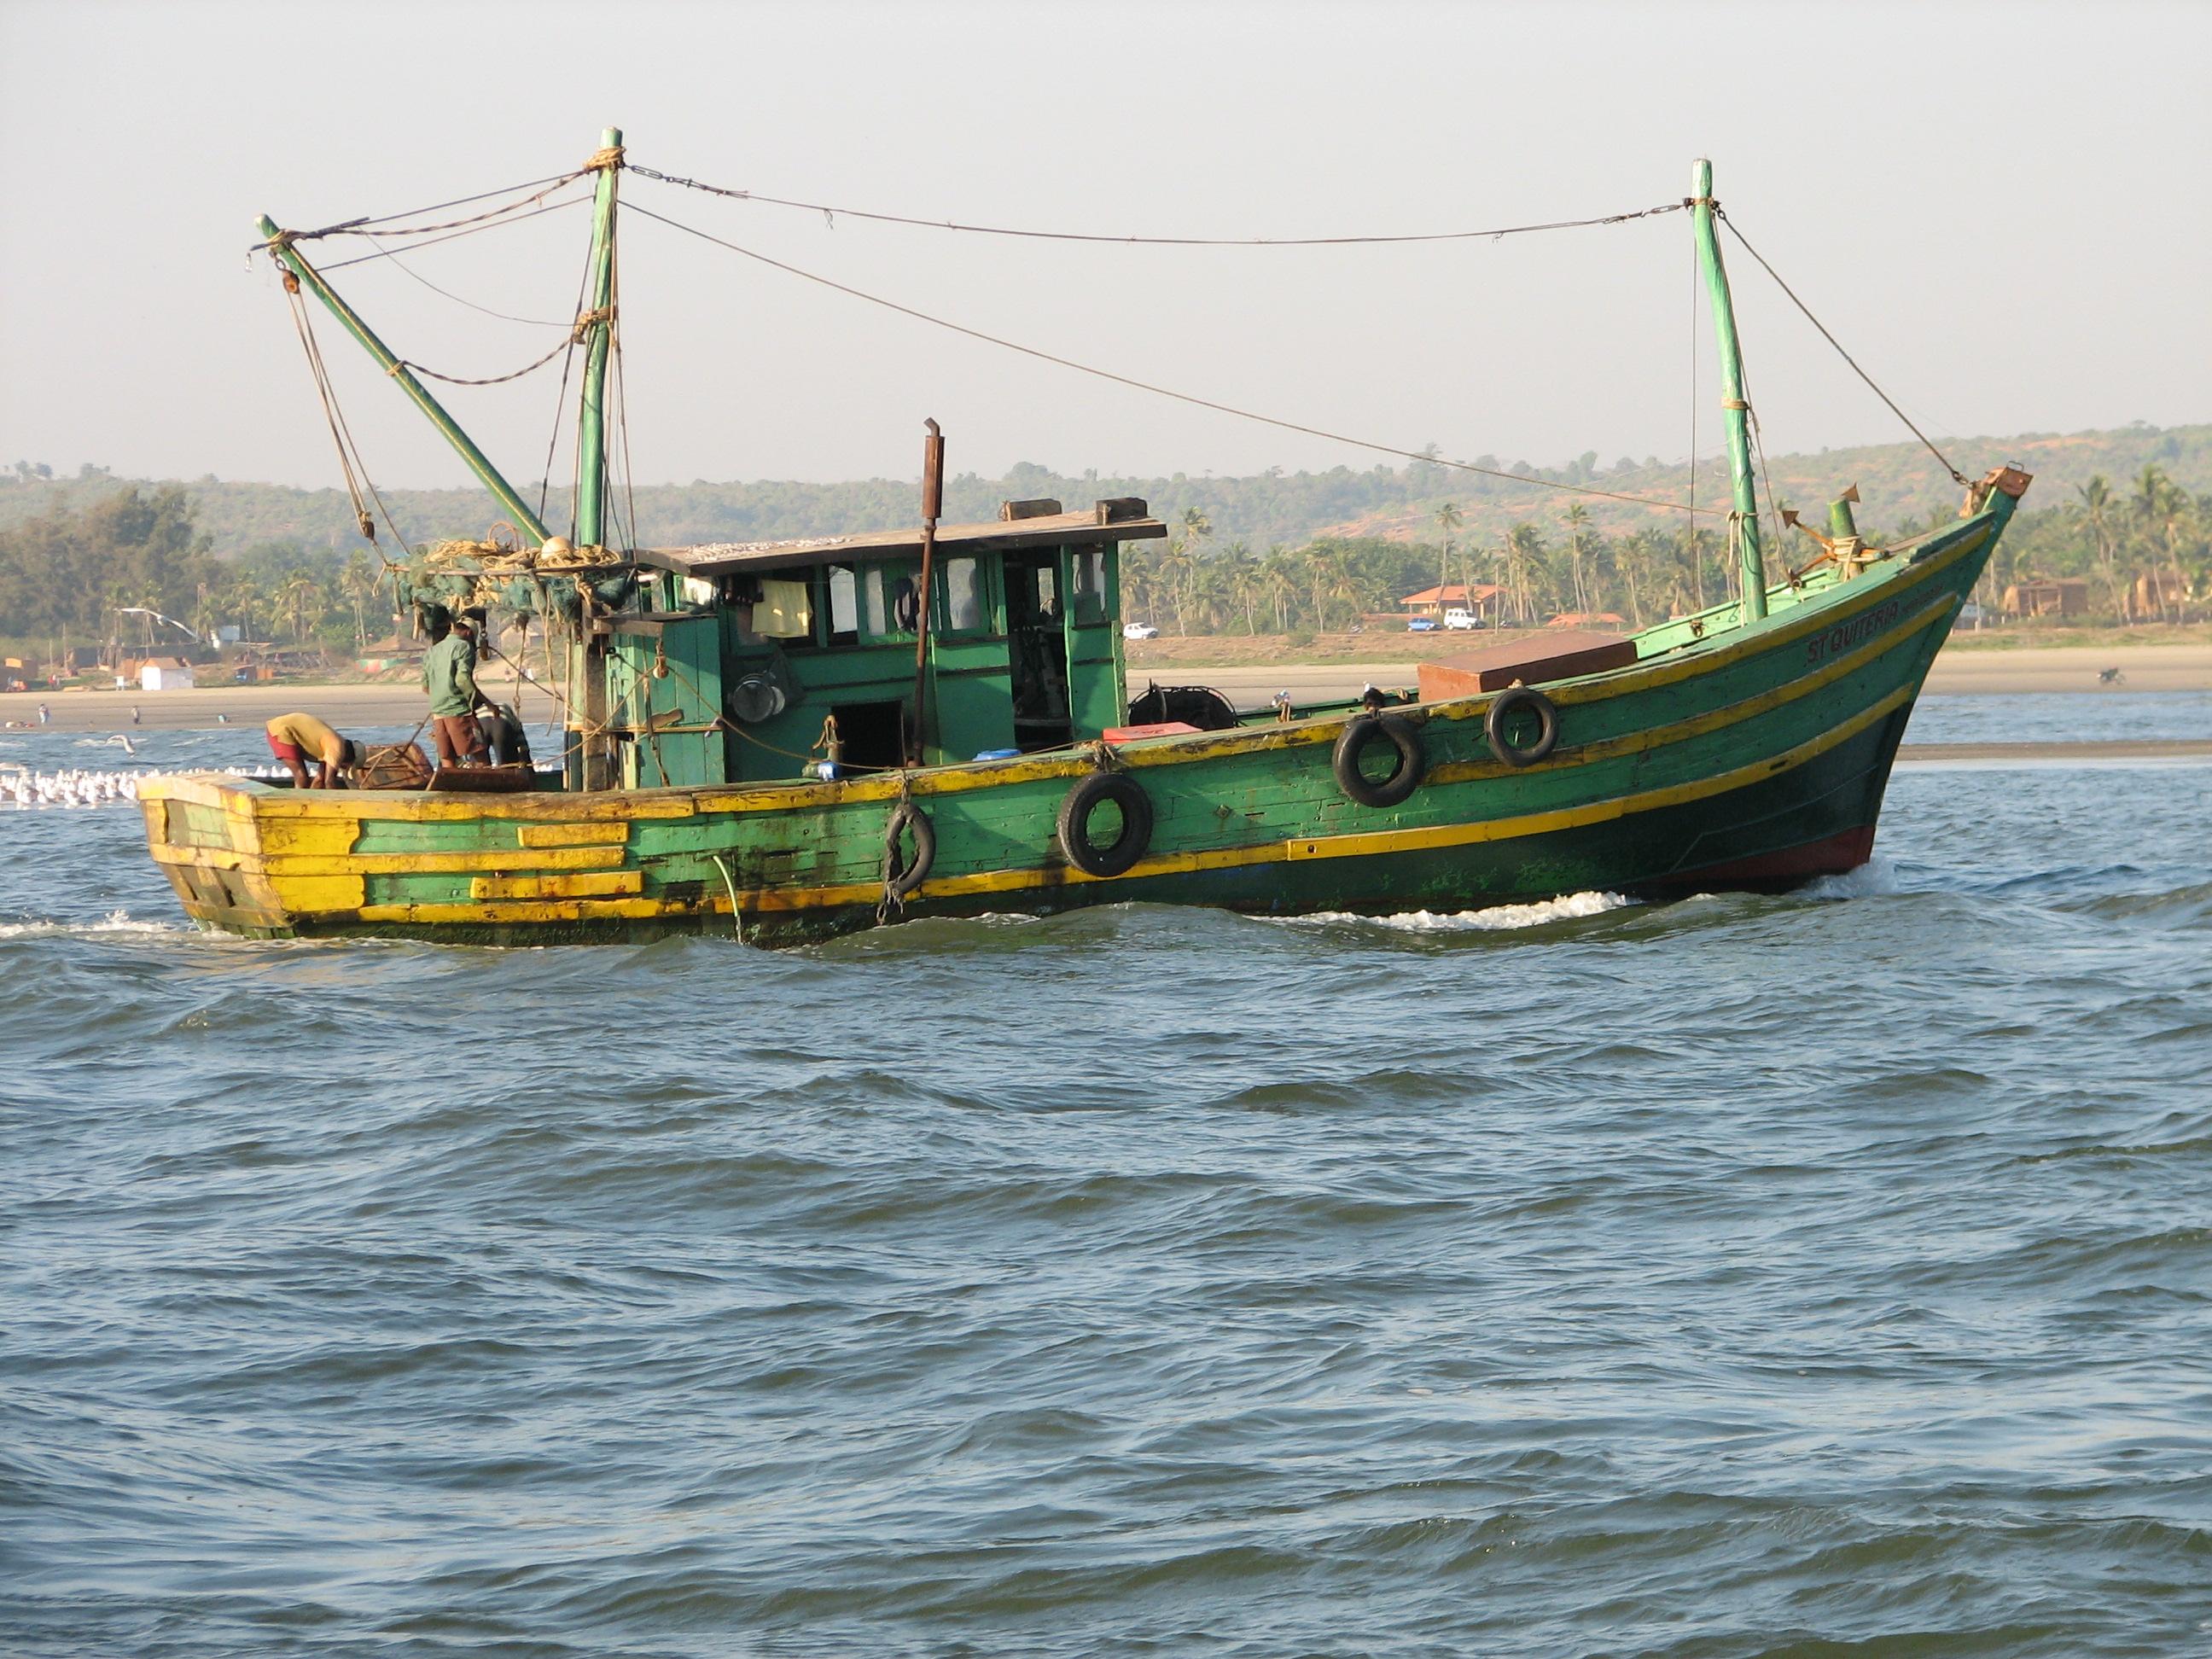 File:Fishing Boat Goa India.jpg - Wikimedia Commons